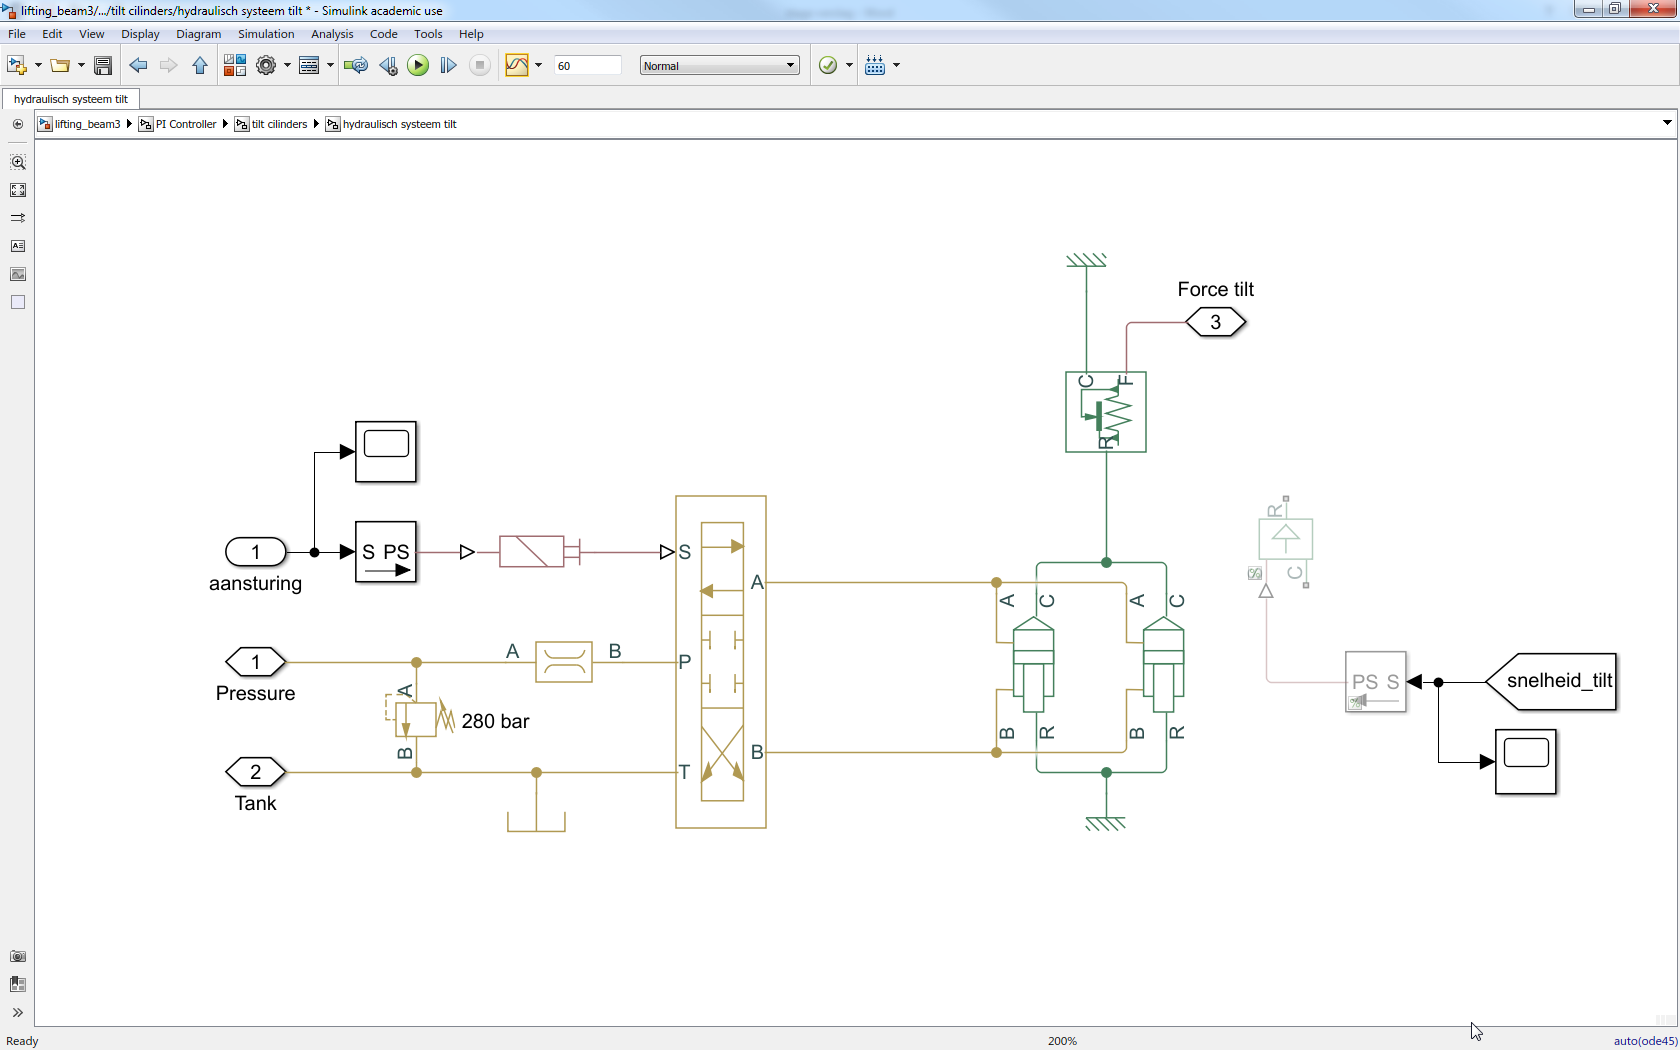 hydraulic system.png